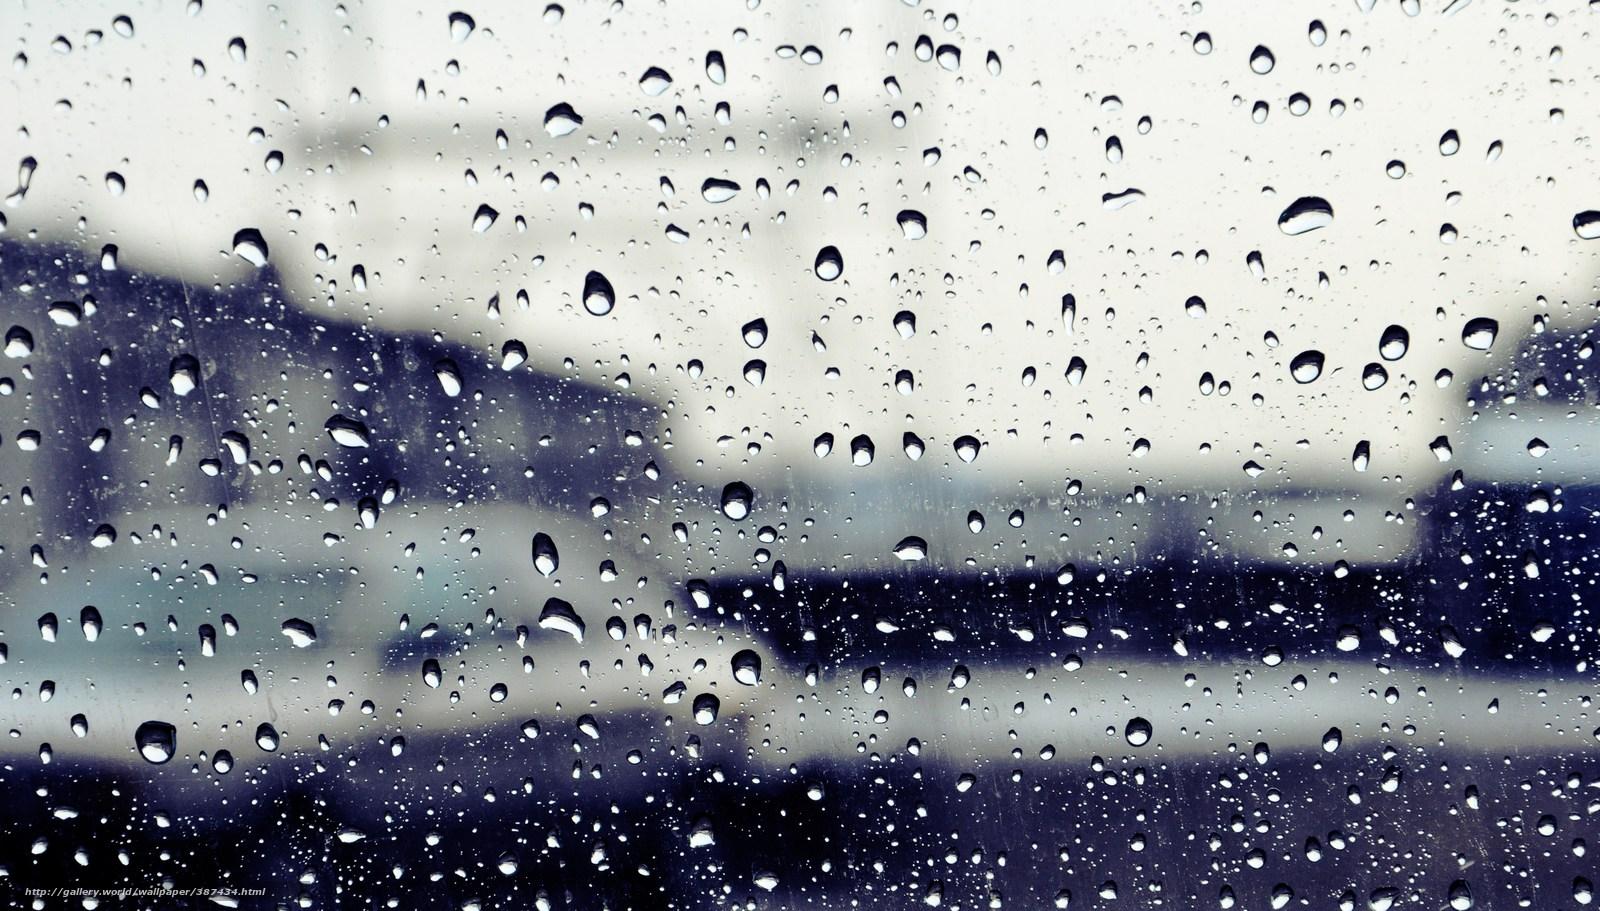 raindrops full hd wallpapers